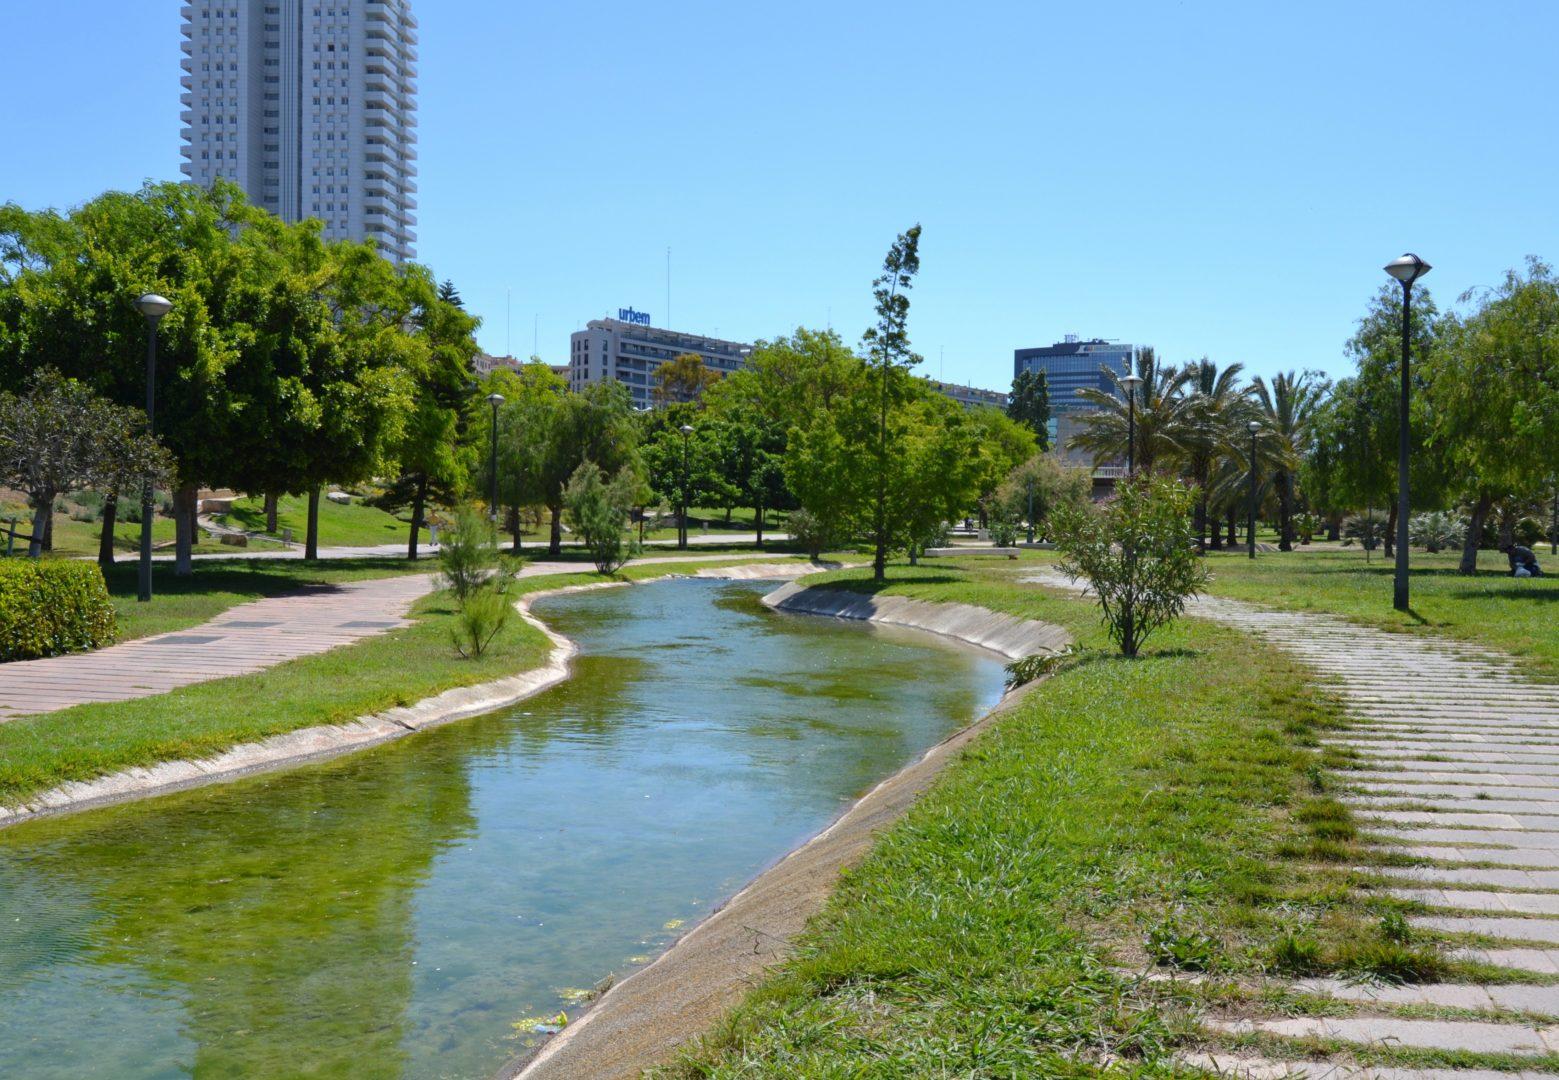 Jard n del turia - Jardin del turia valencia ...